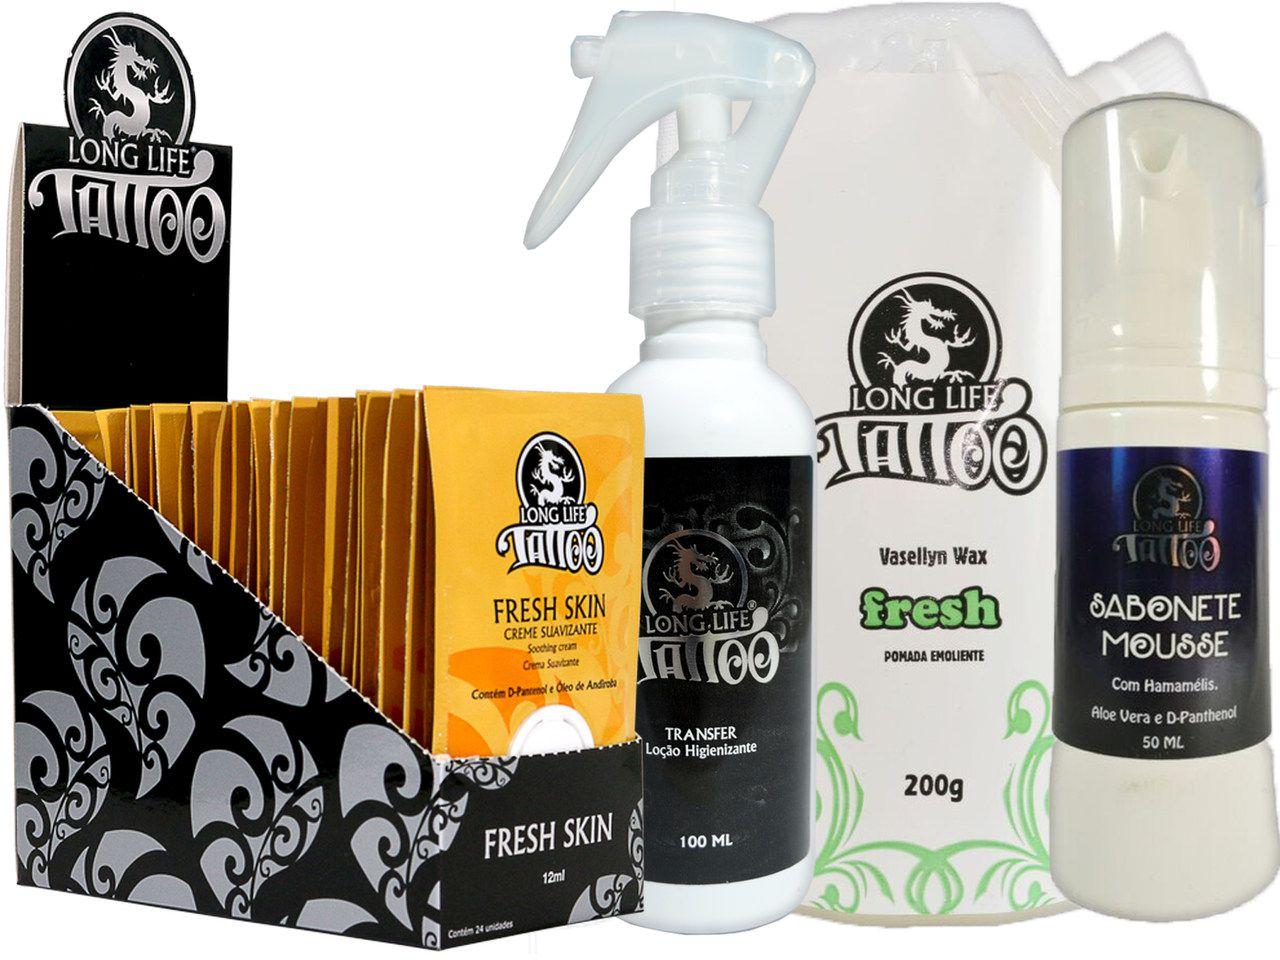 Caixa Fresh Skin Sachê (24 un.) + Sabonete Mousse + Vasellyn Fresh 200g + Transfer Loção